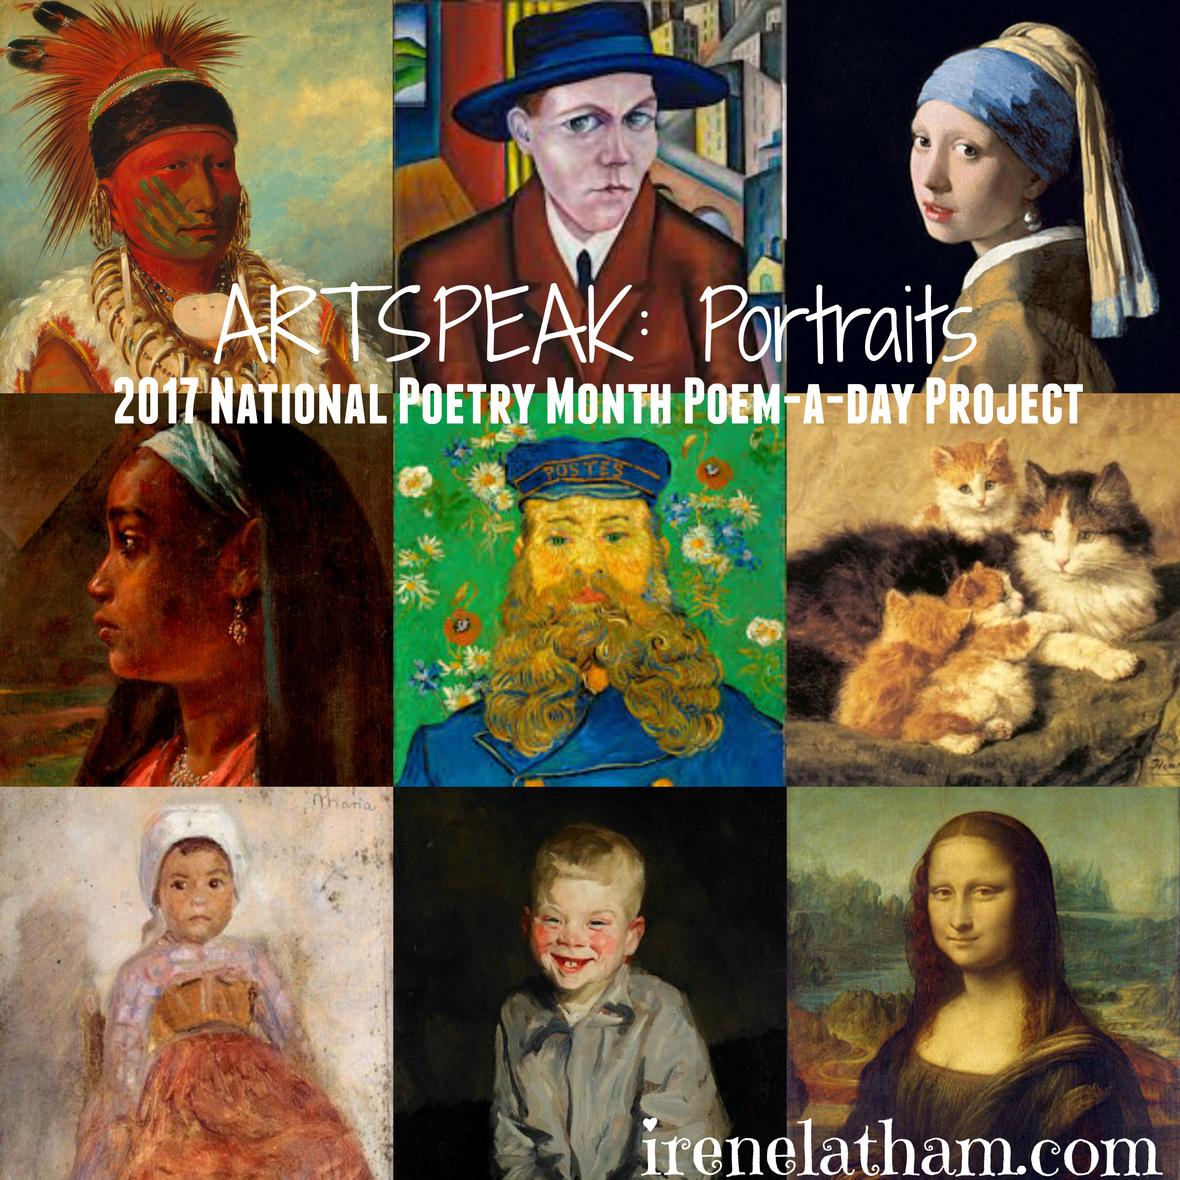 Artspeak Portraits Poetry 2017 Irene Latham